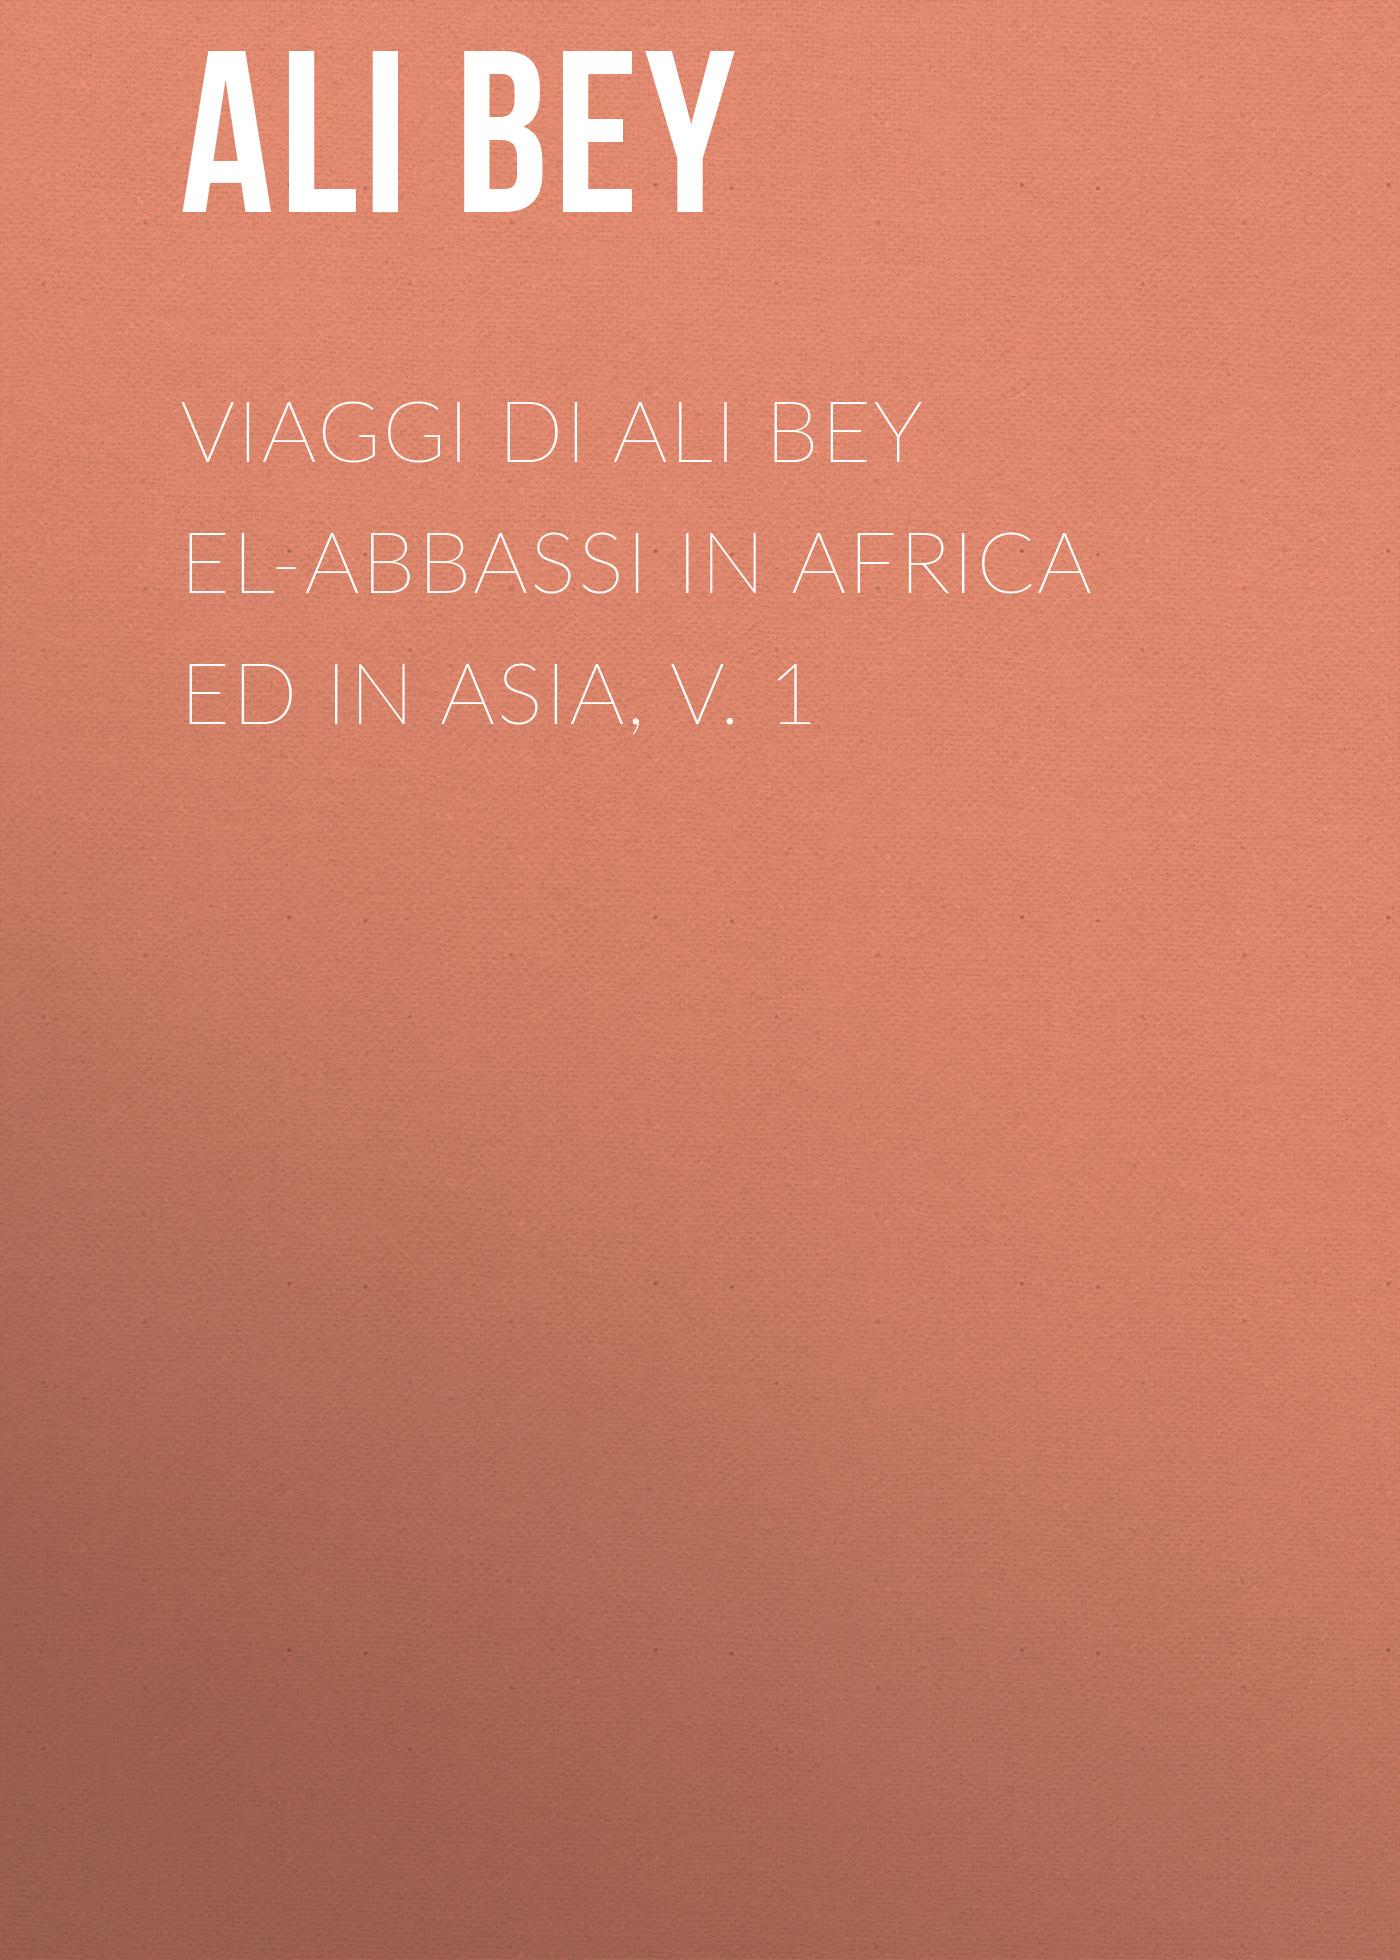 Ali Bey Viaggi di Ali Bey el-Abbassi in Africa ed in Asia, v. 1 dawoud bey